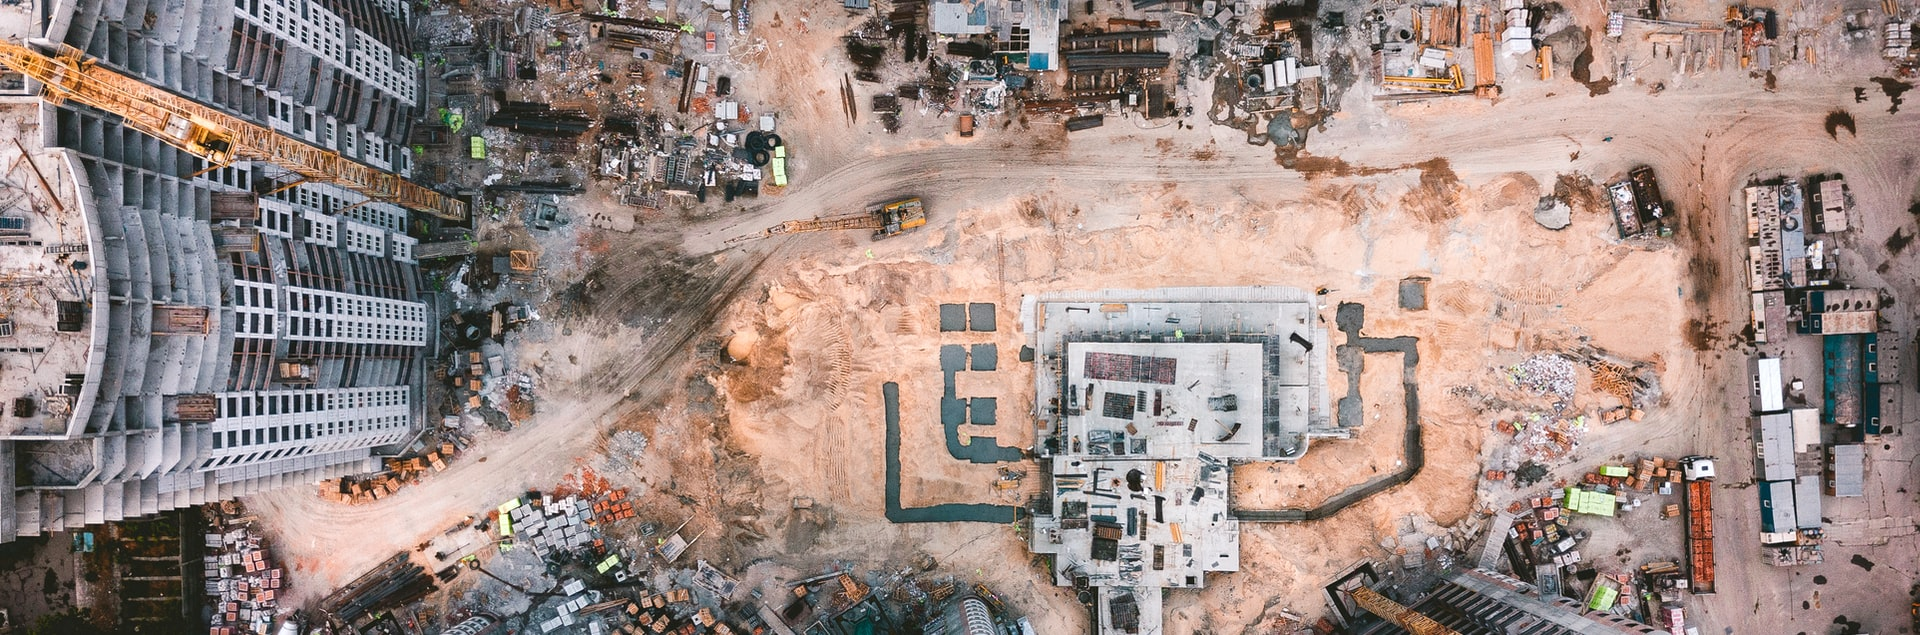 Construction Site taken by Ivan Bandura